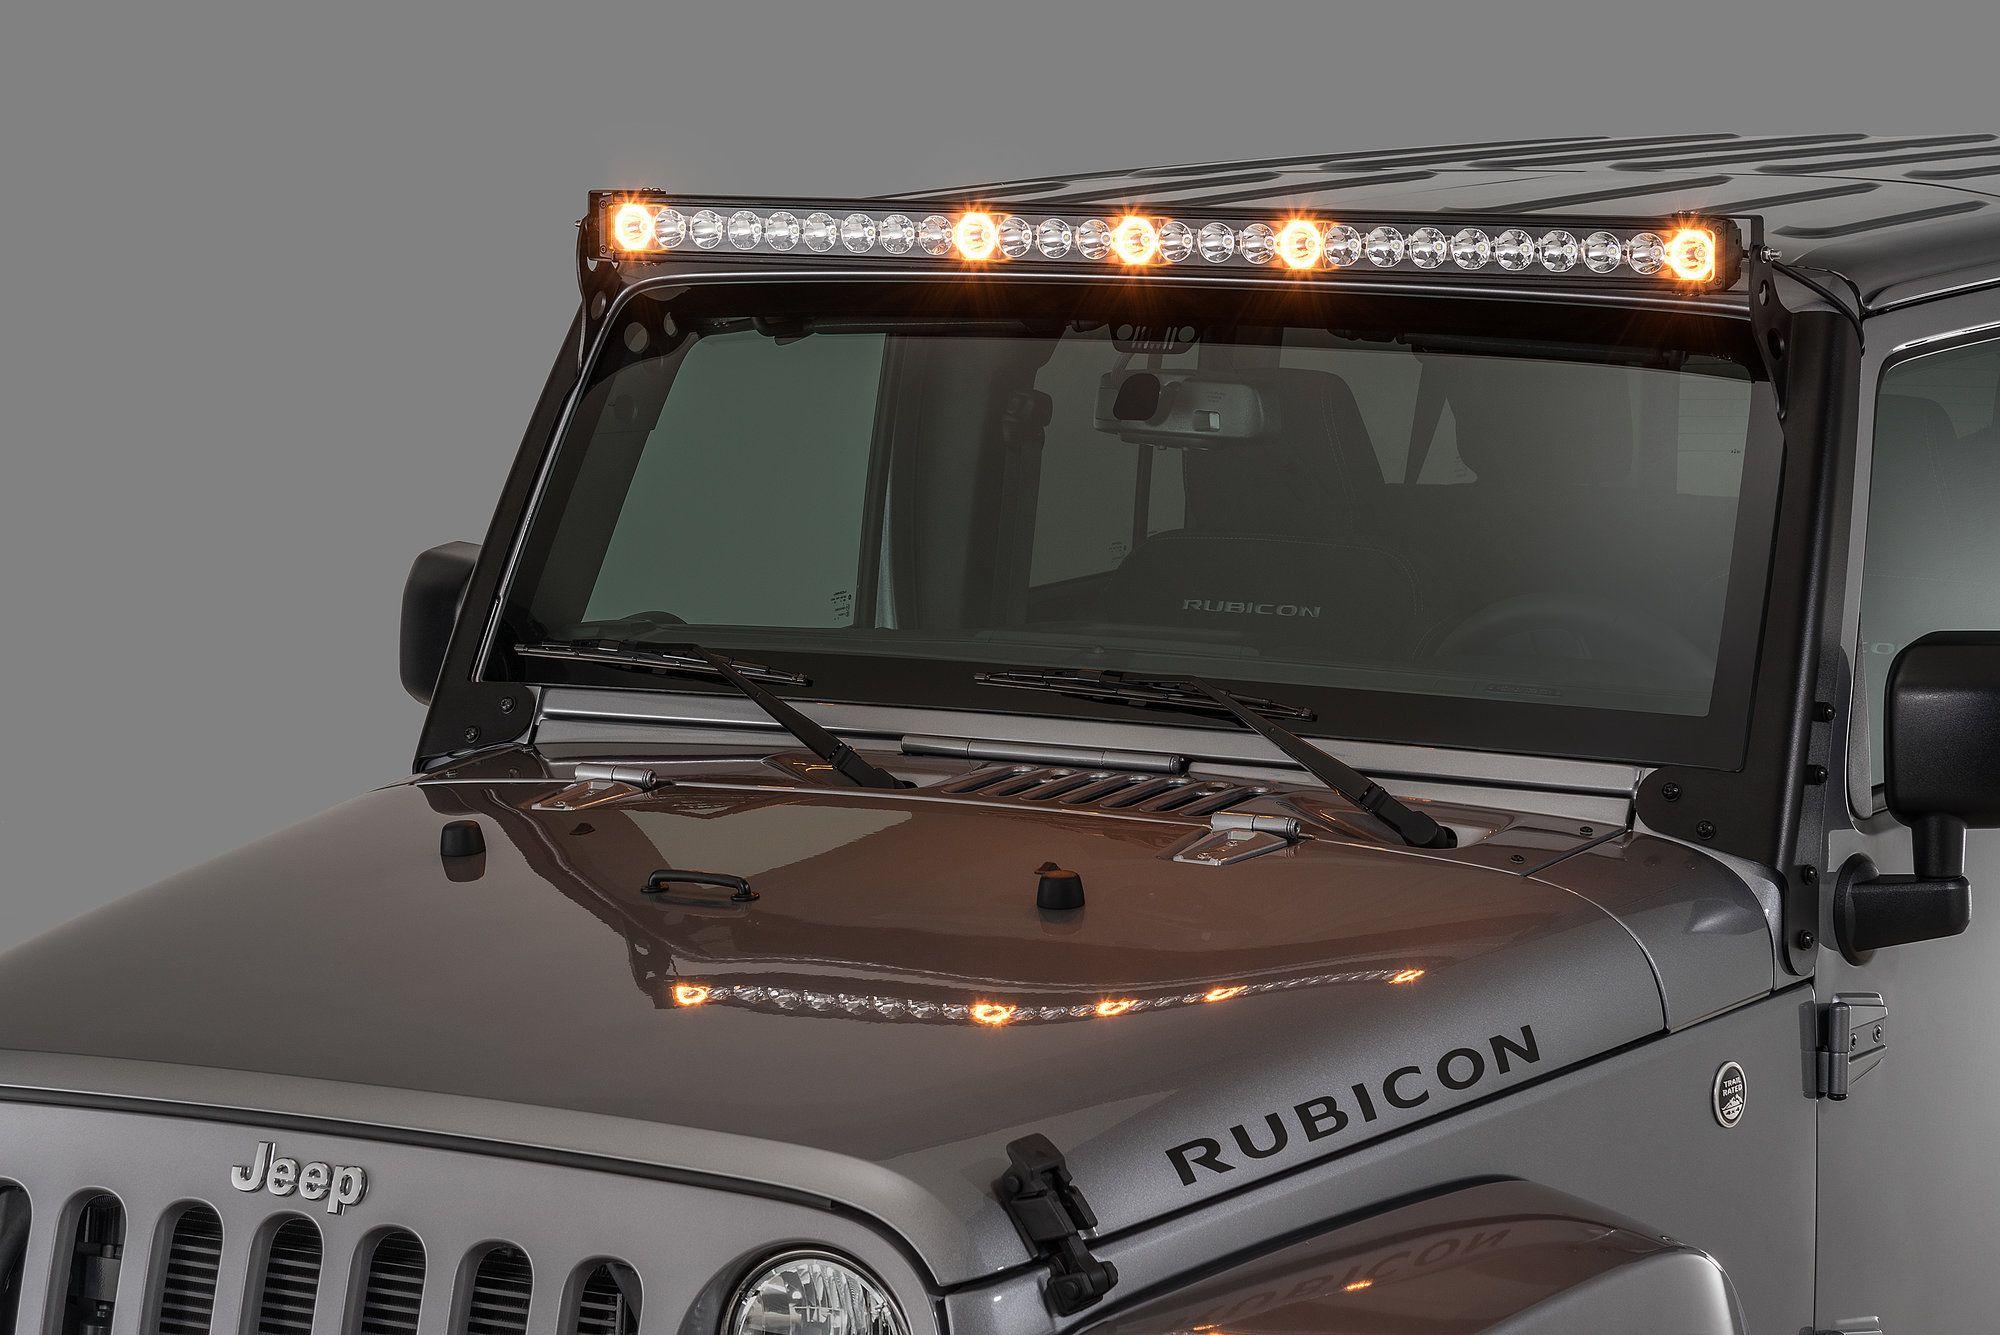 Quadratec J5 Led Light Bar With Amber Clearance Cab Lights Led Light Bars Jeep Led Lights Jeep Lights